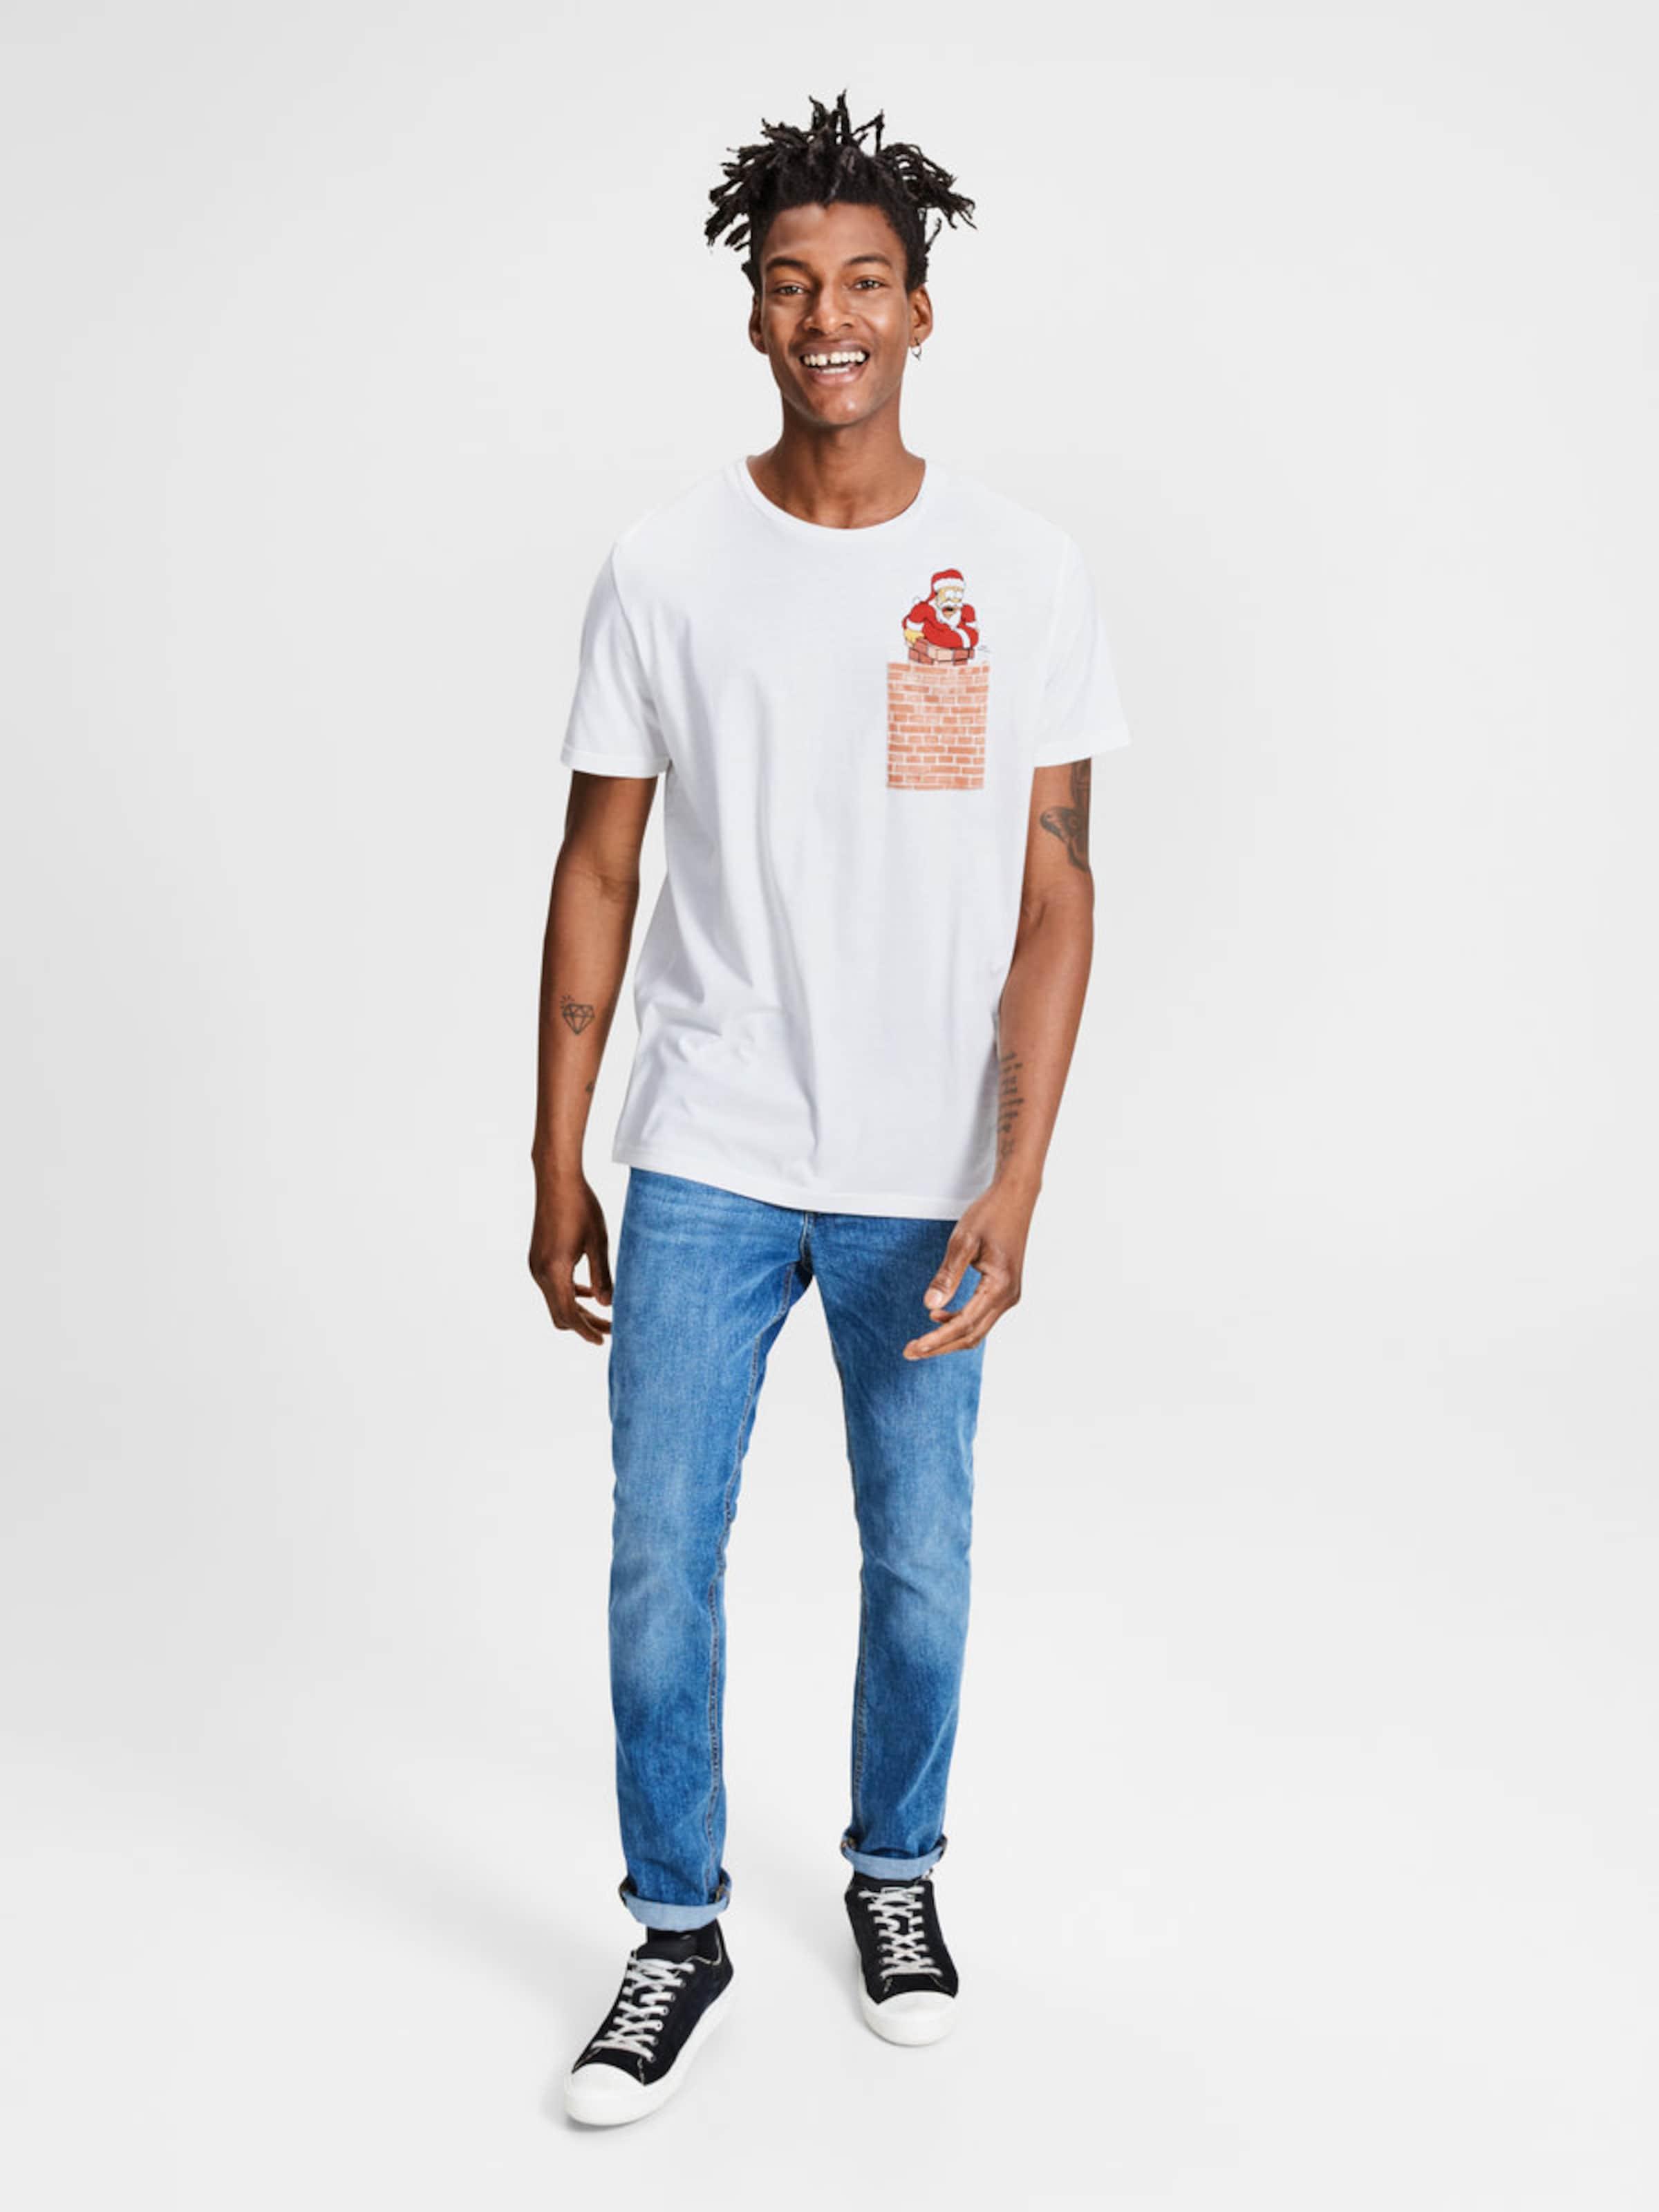 JACK & JONES T-Shirt 'The Simpsons' Outlet-Store Günstiger Preis 6E9ECe7